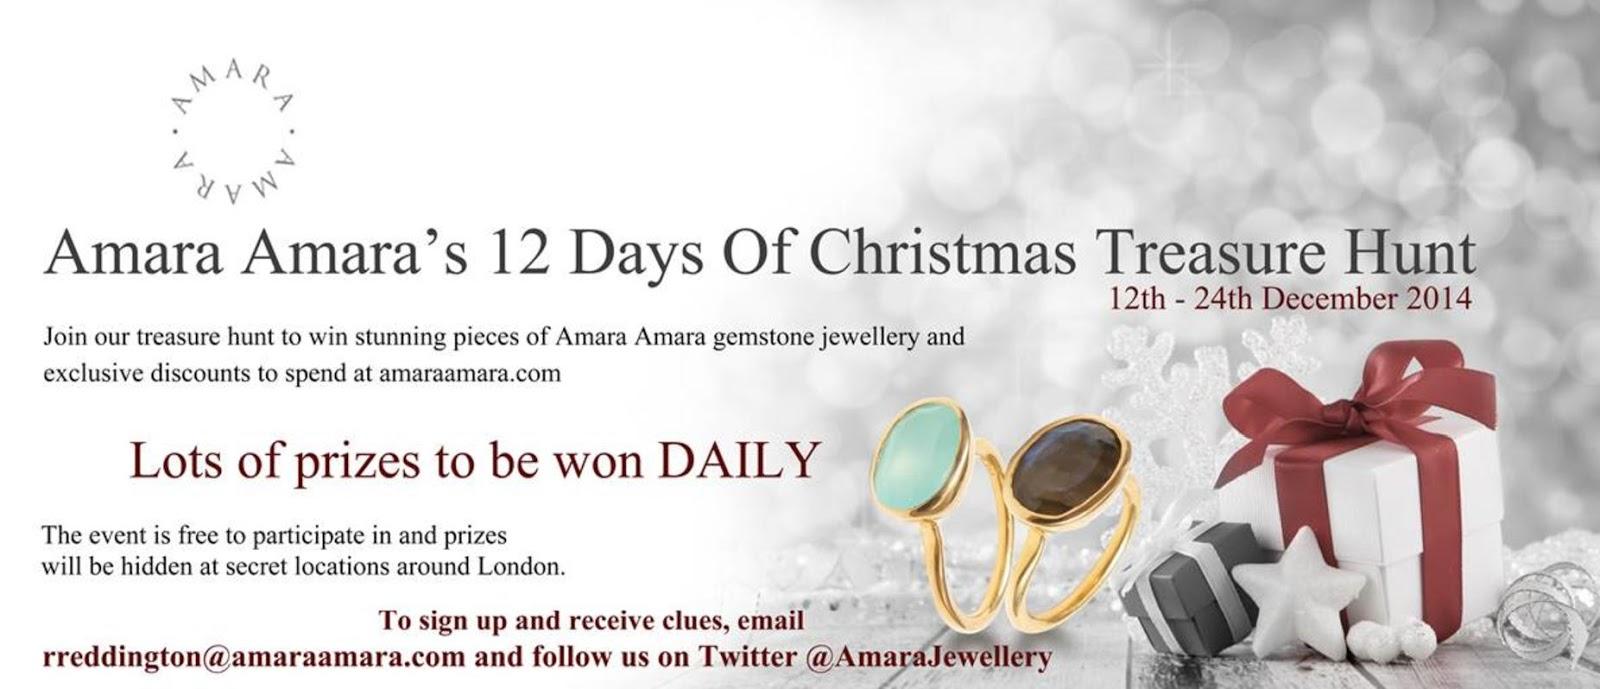 Amara Amara 12 Days of Christmas Treasure Hunt